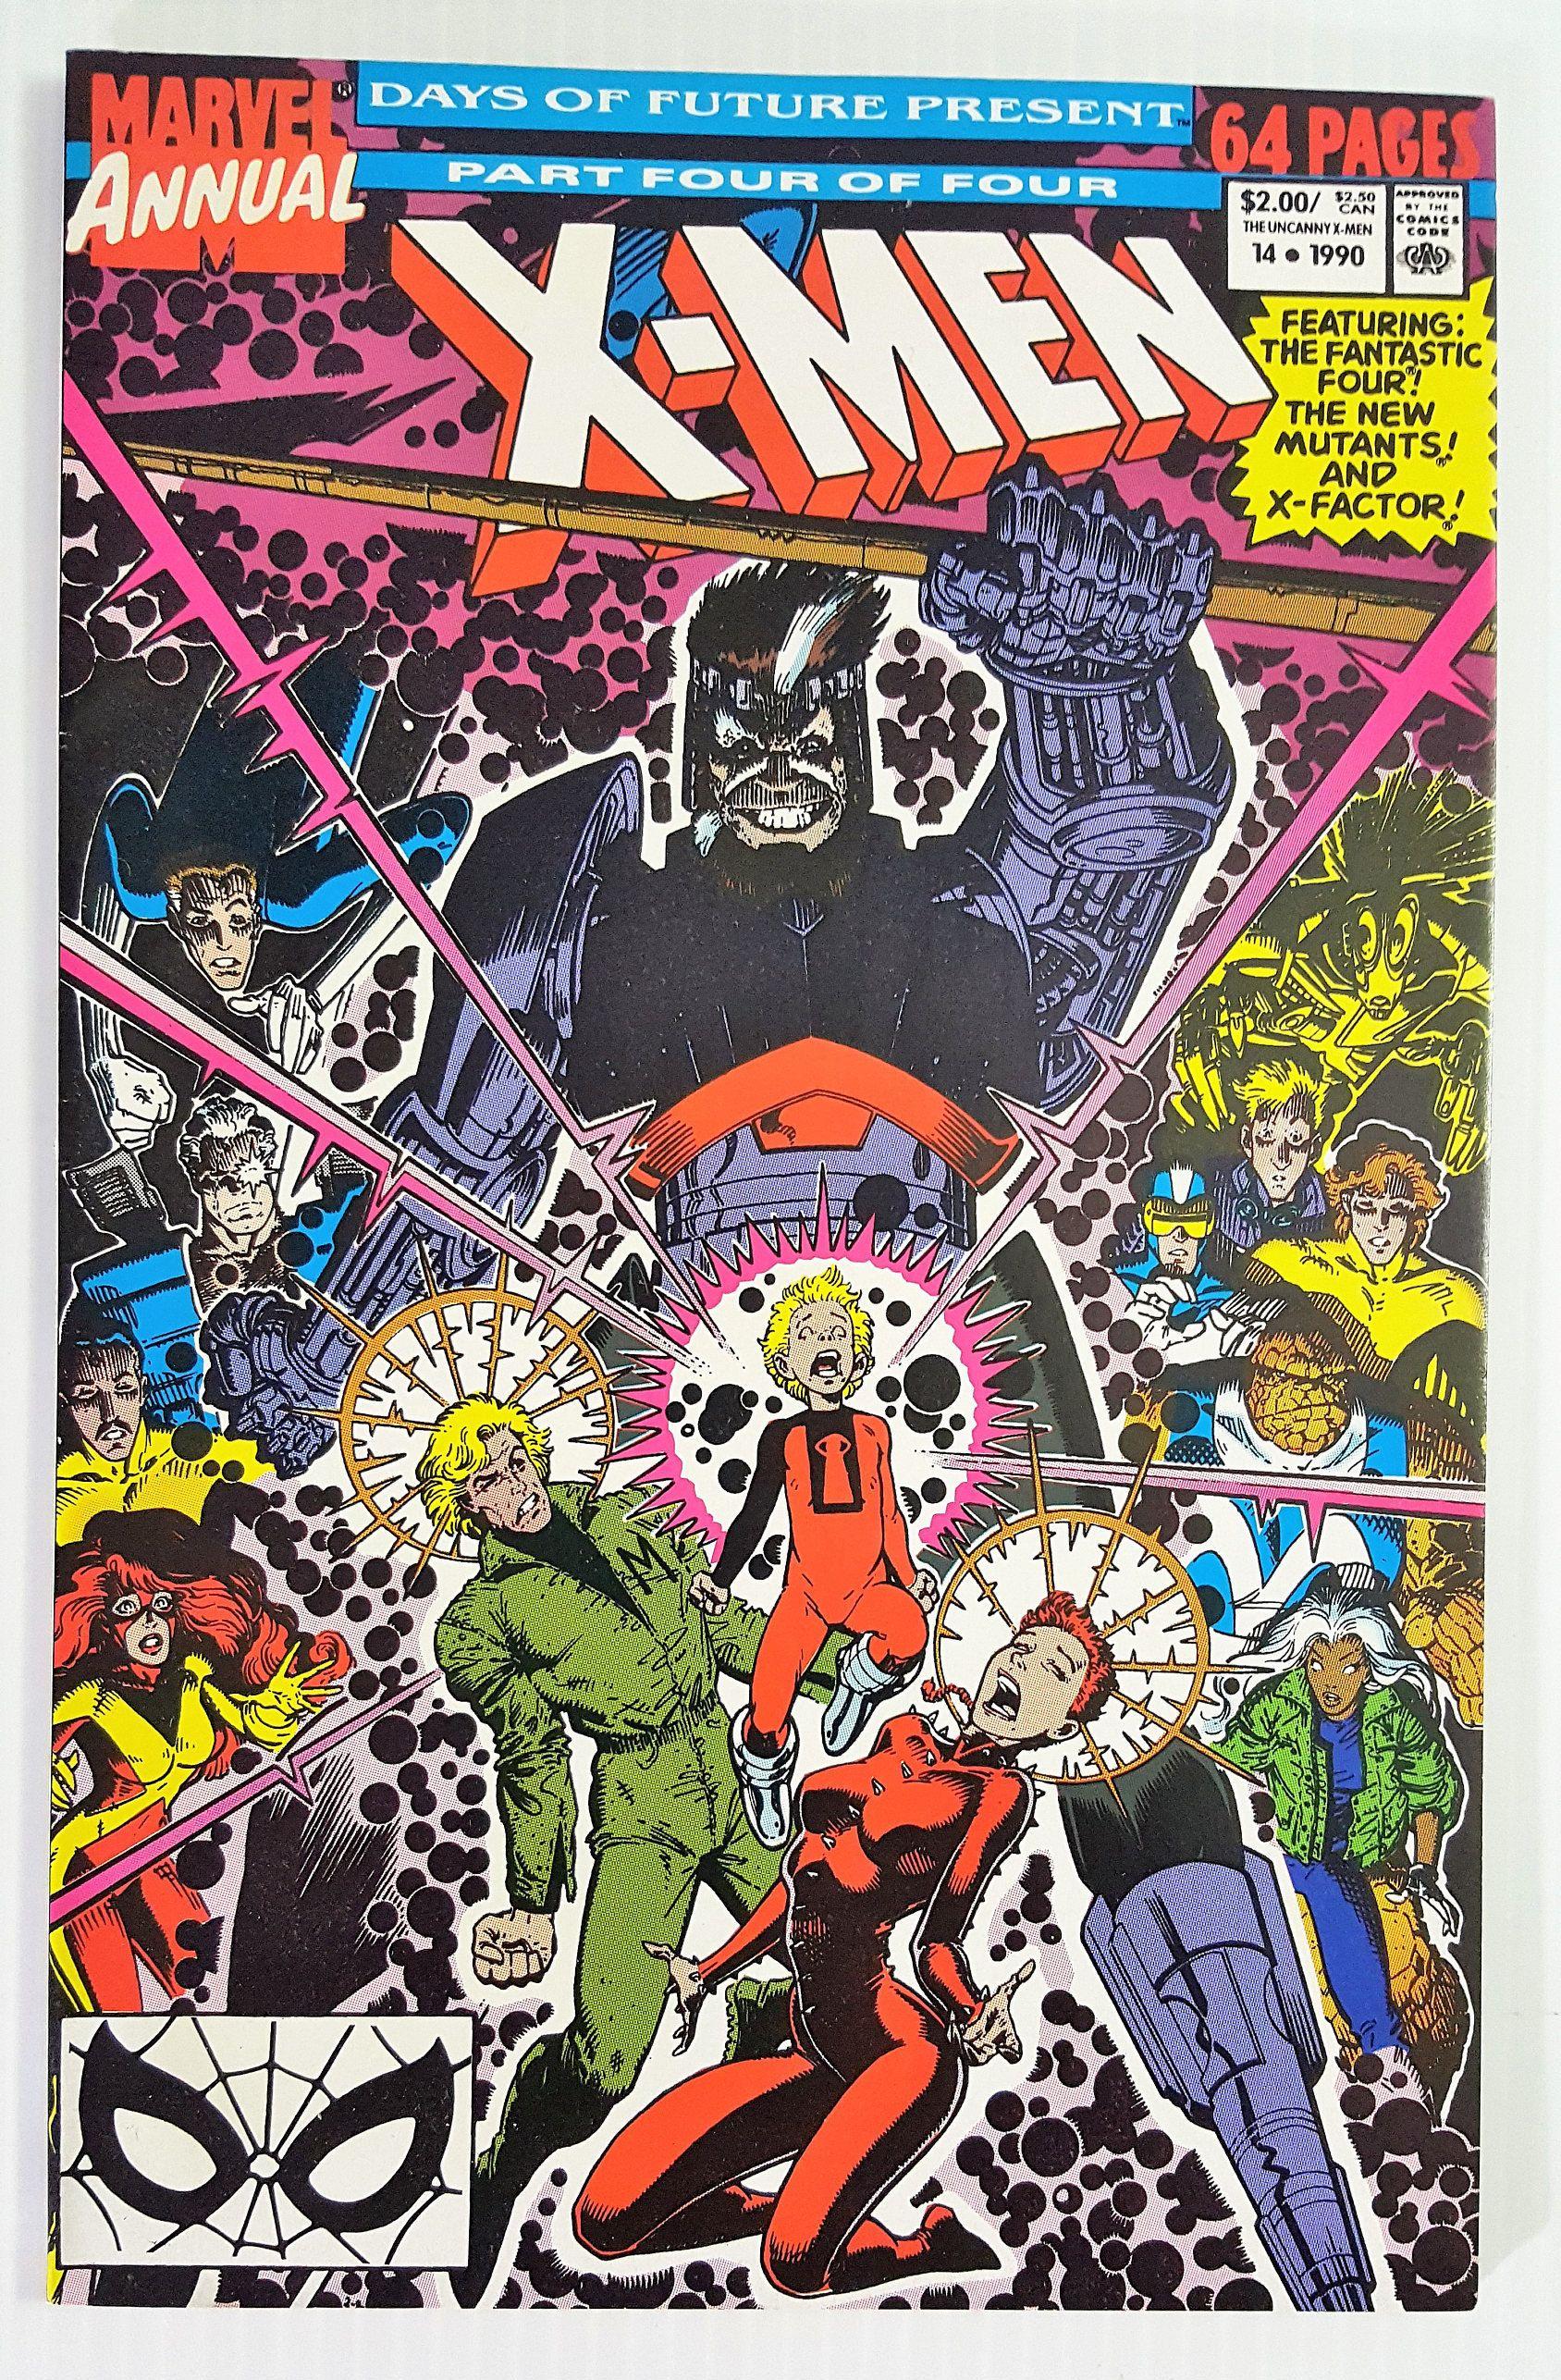 Gambit 1st Appearance X Men Annual 14 Art Adams Art X Men Etsy In 2020 X Men Marvel Comic Books Marvel